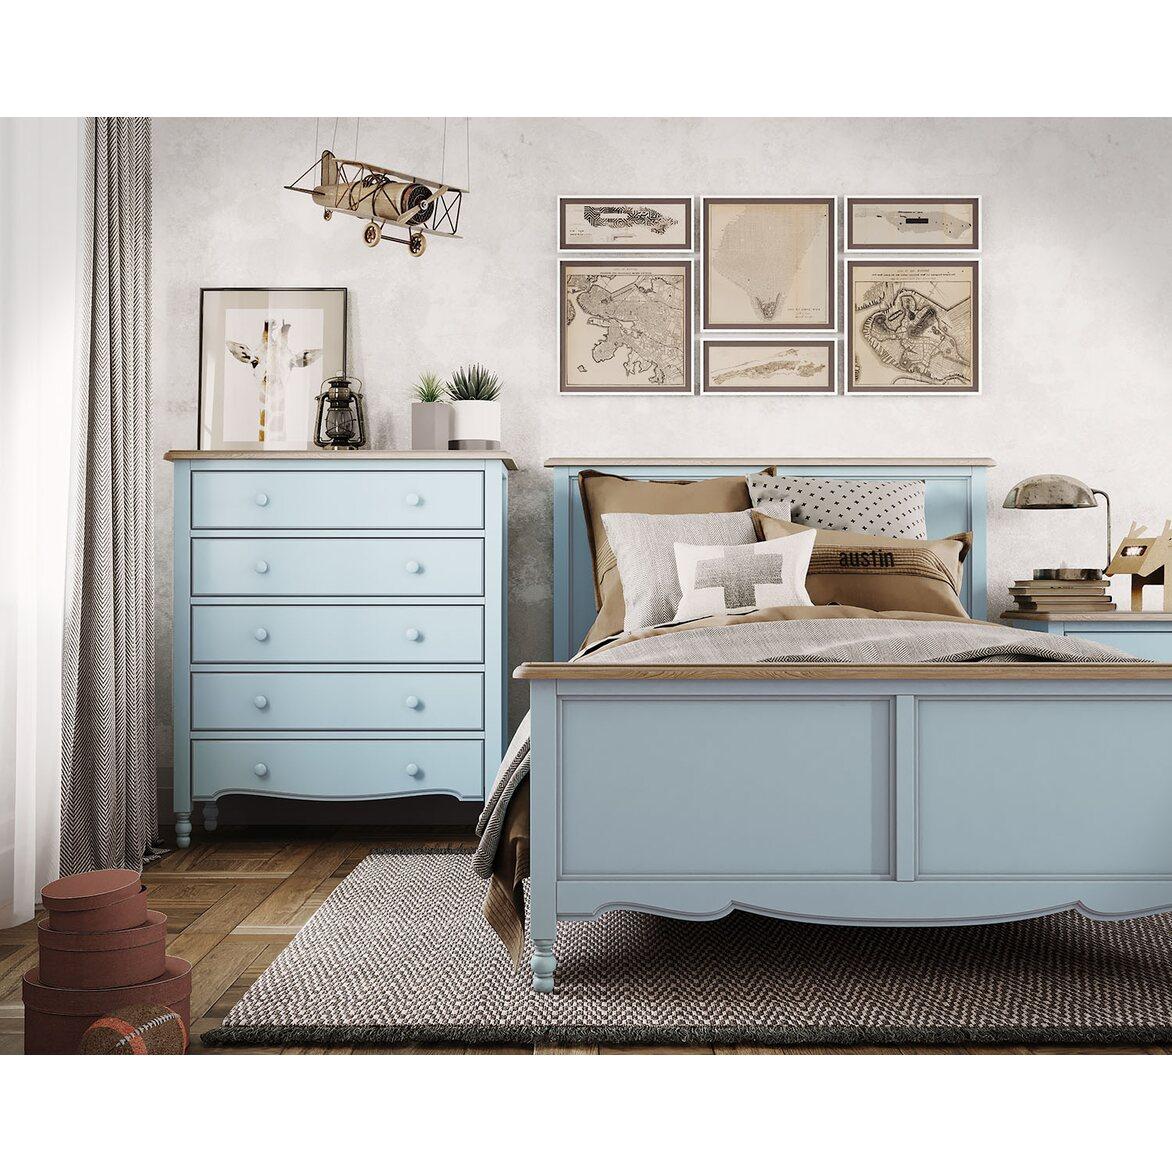 Шкаф двухстворчатый Leblanc, голубой 7 | Платяные шкафы Kingsby